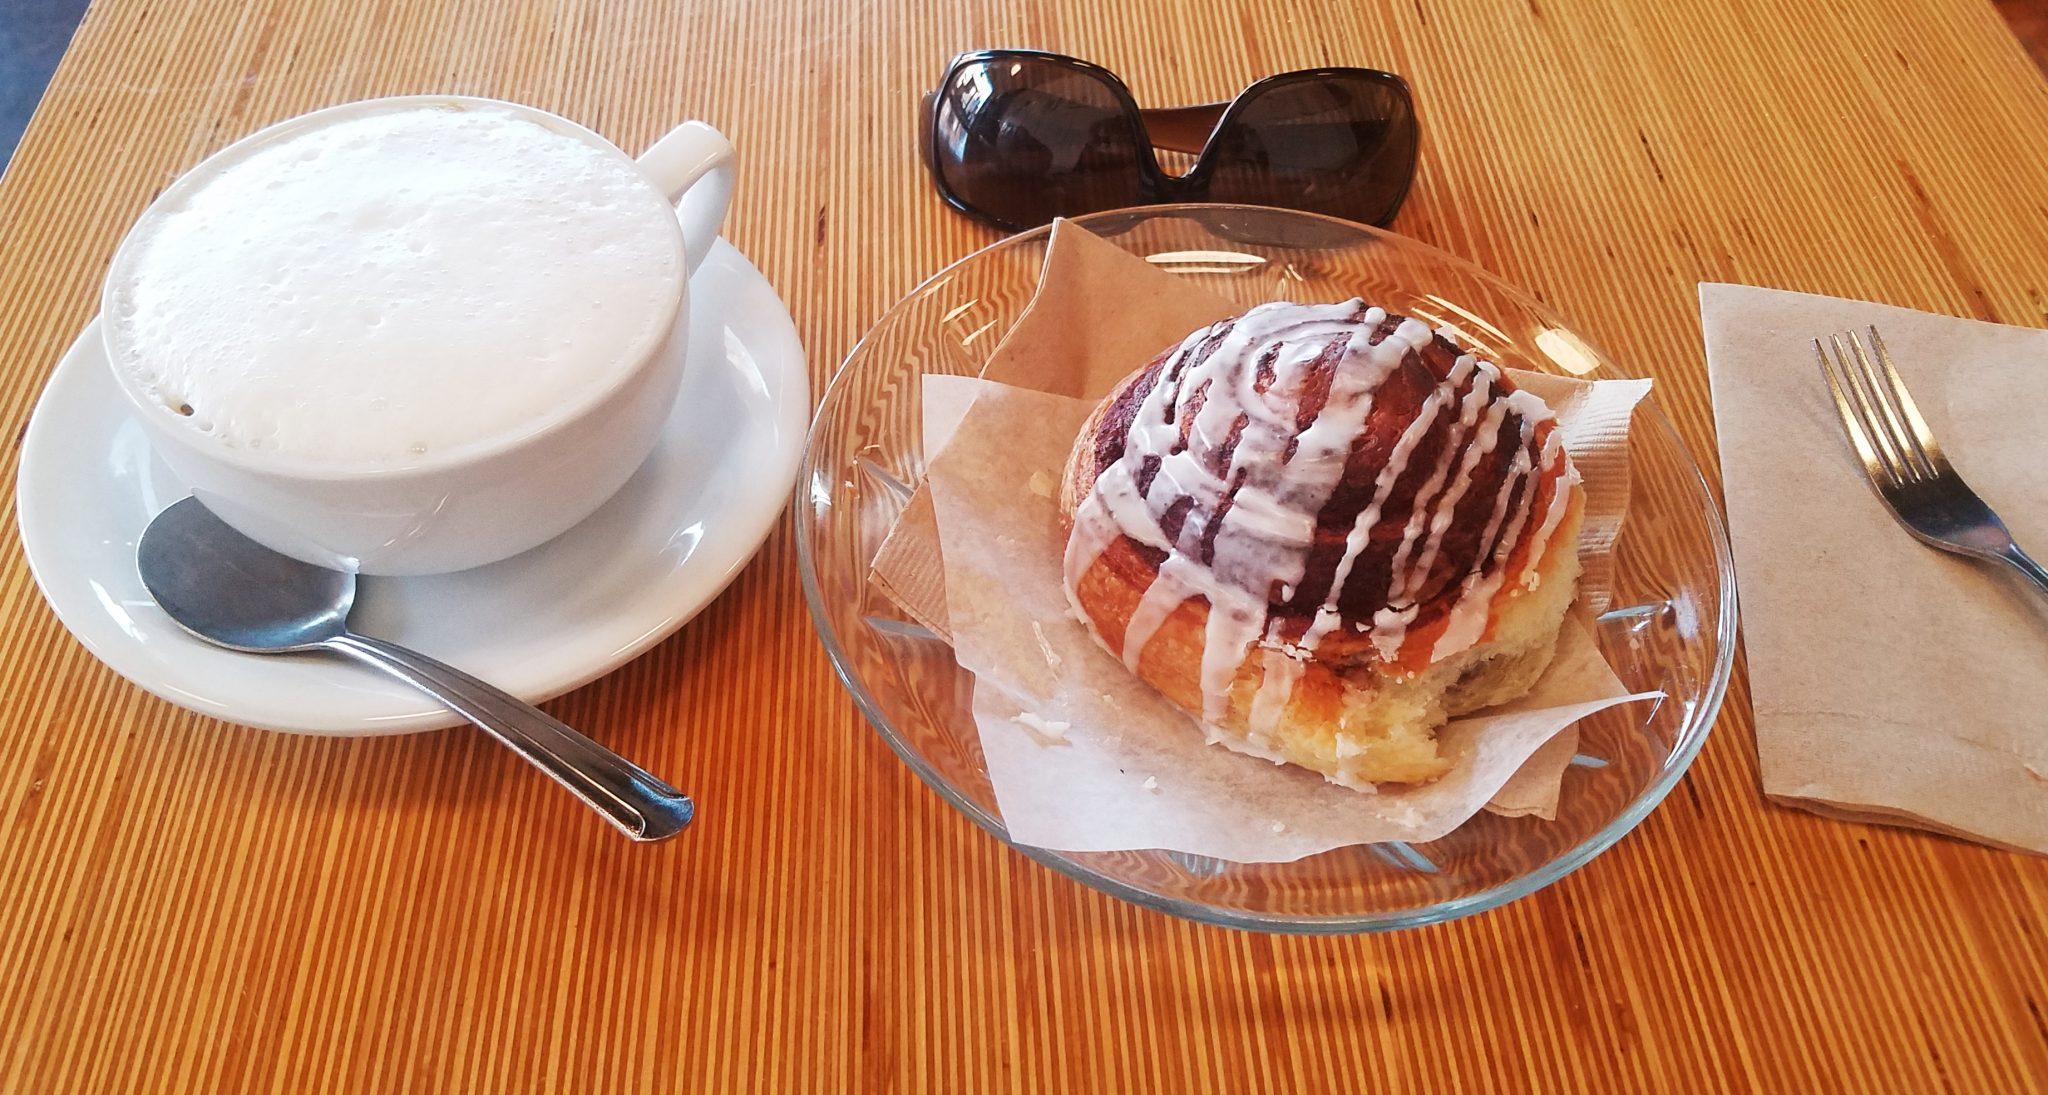 Cinnamon Roll and Cappuccino